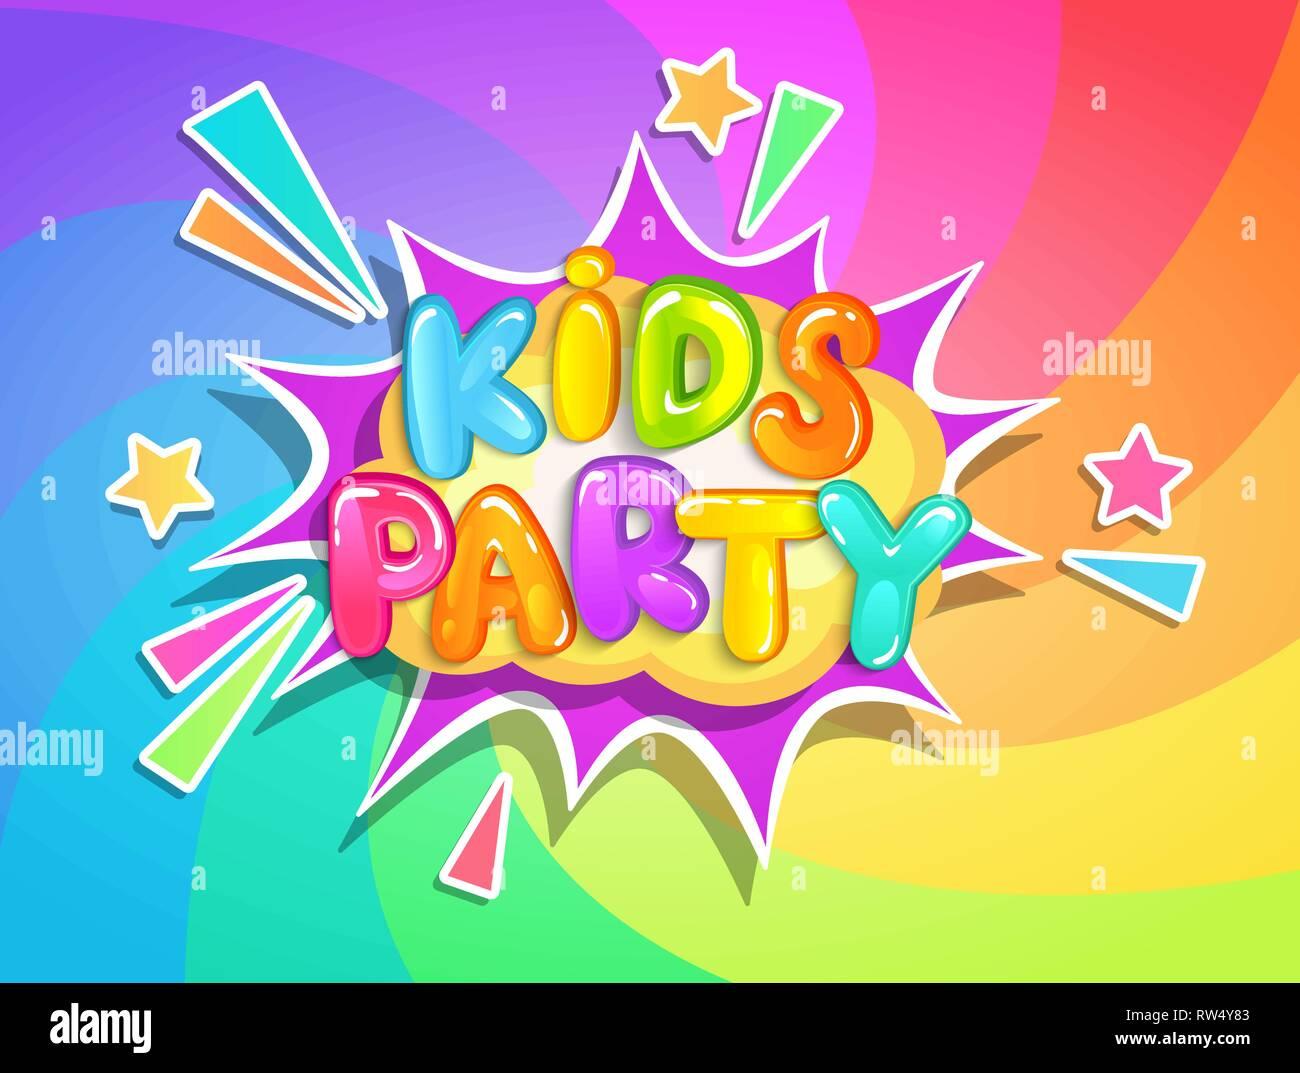 Kids party banner on rainbow swirl spiral background in